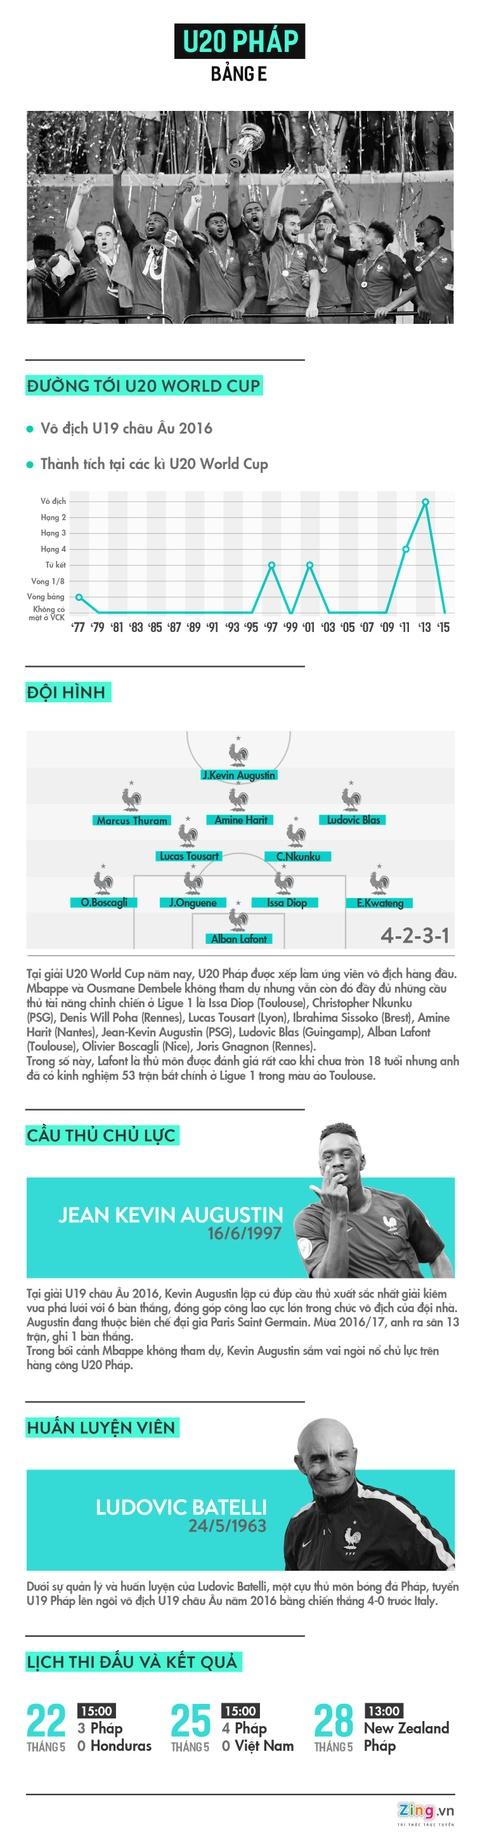 U20 Phap - ung vien so 1 cho ngoi vo dich U20 World Cup hinh anh 1